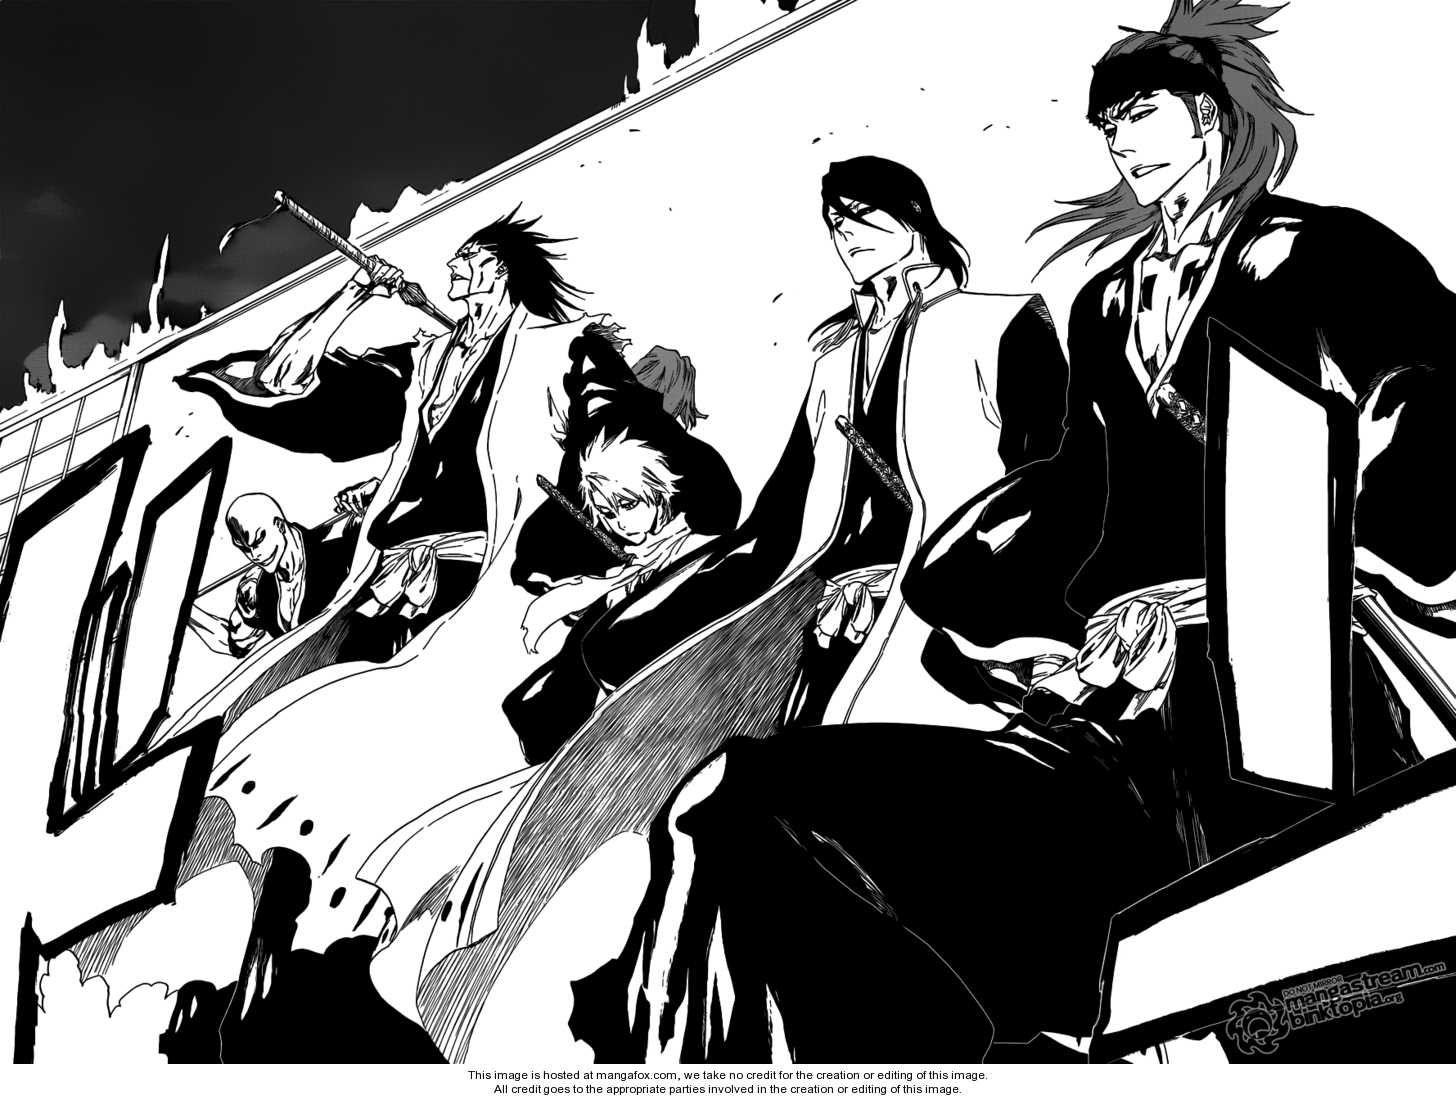 Anime...Total anime geek. Ikkaku, Kenpachi, Toshiro, Byakuya, Renji